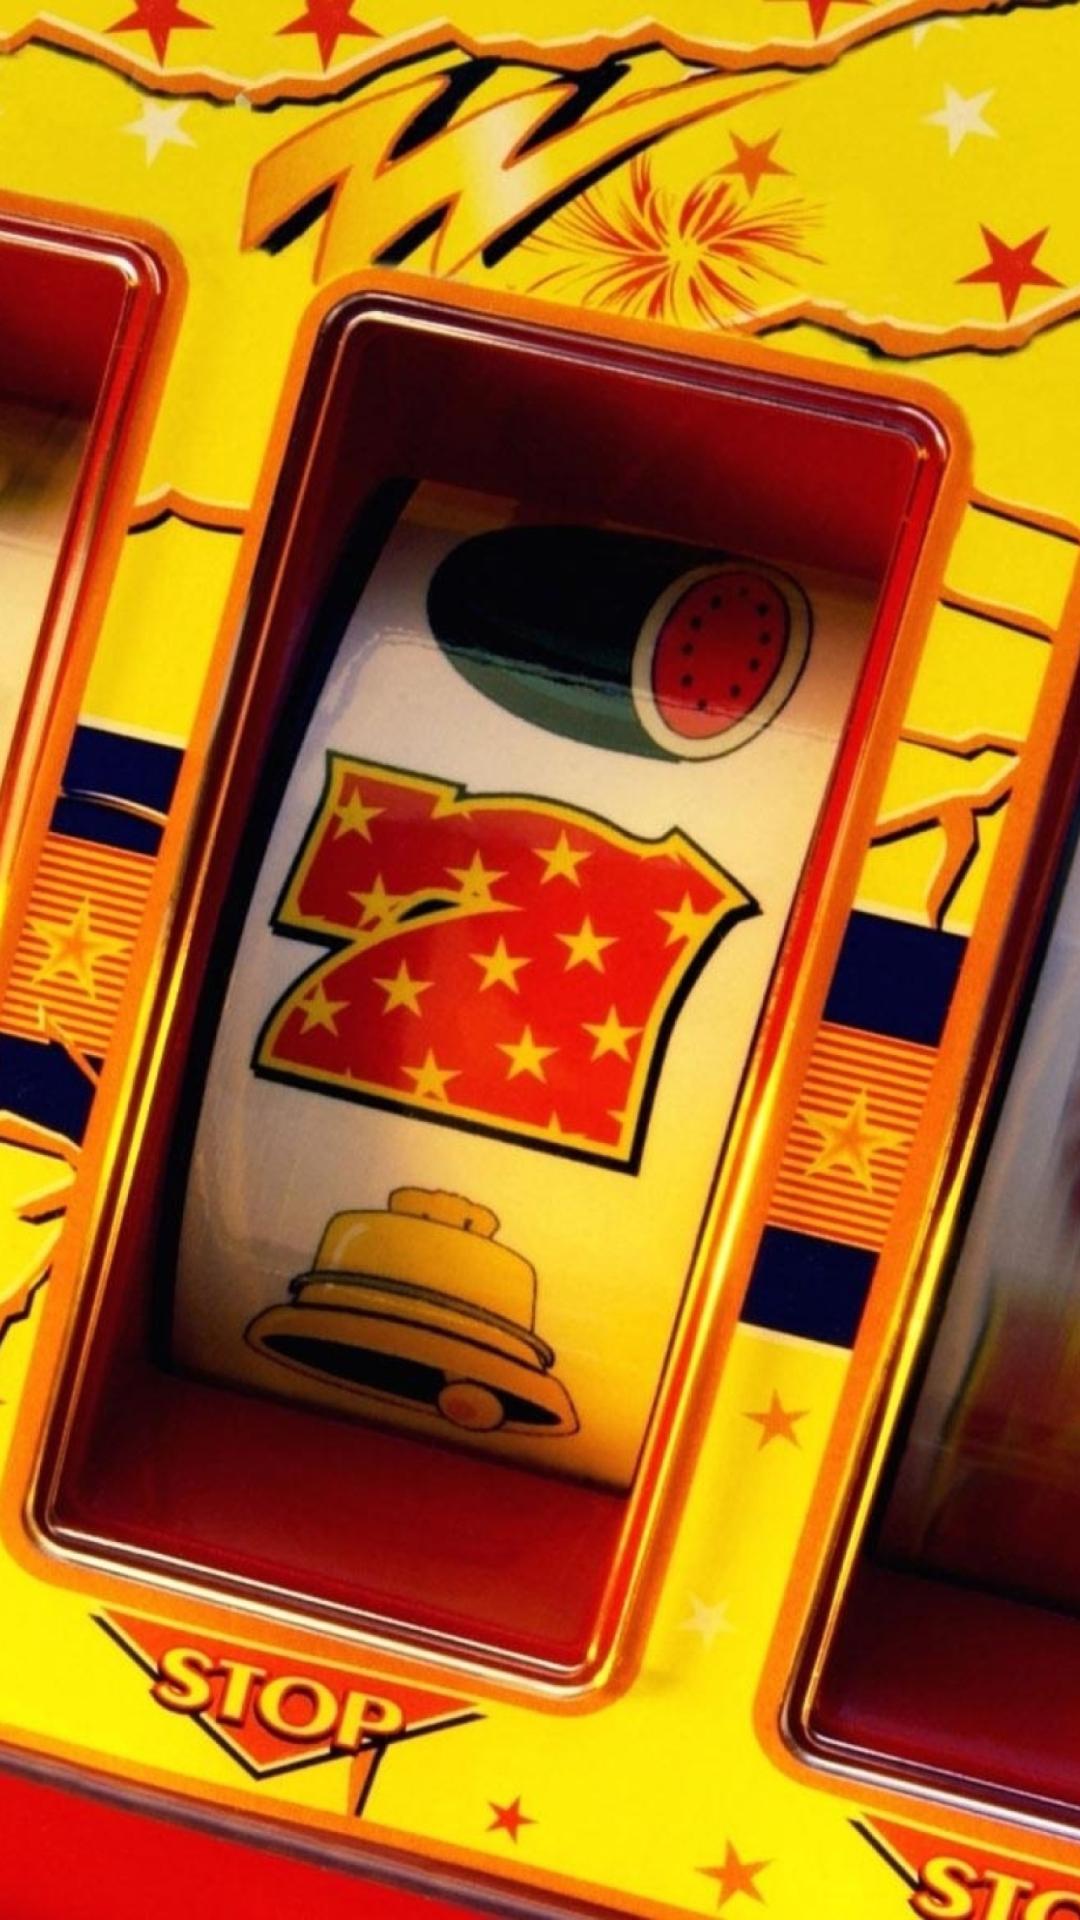 Dramma slot machine